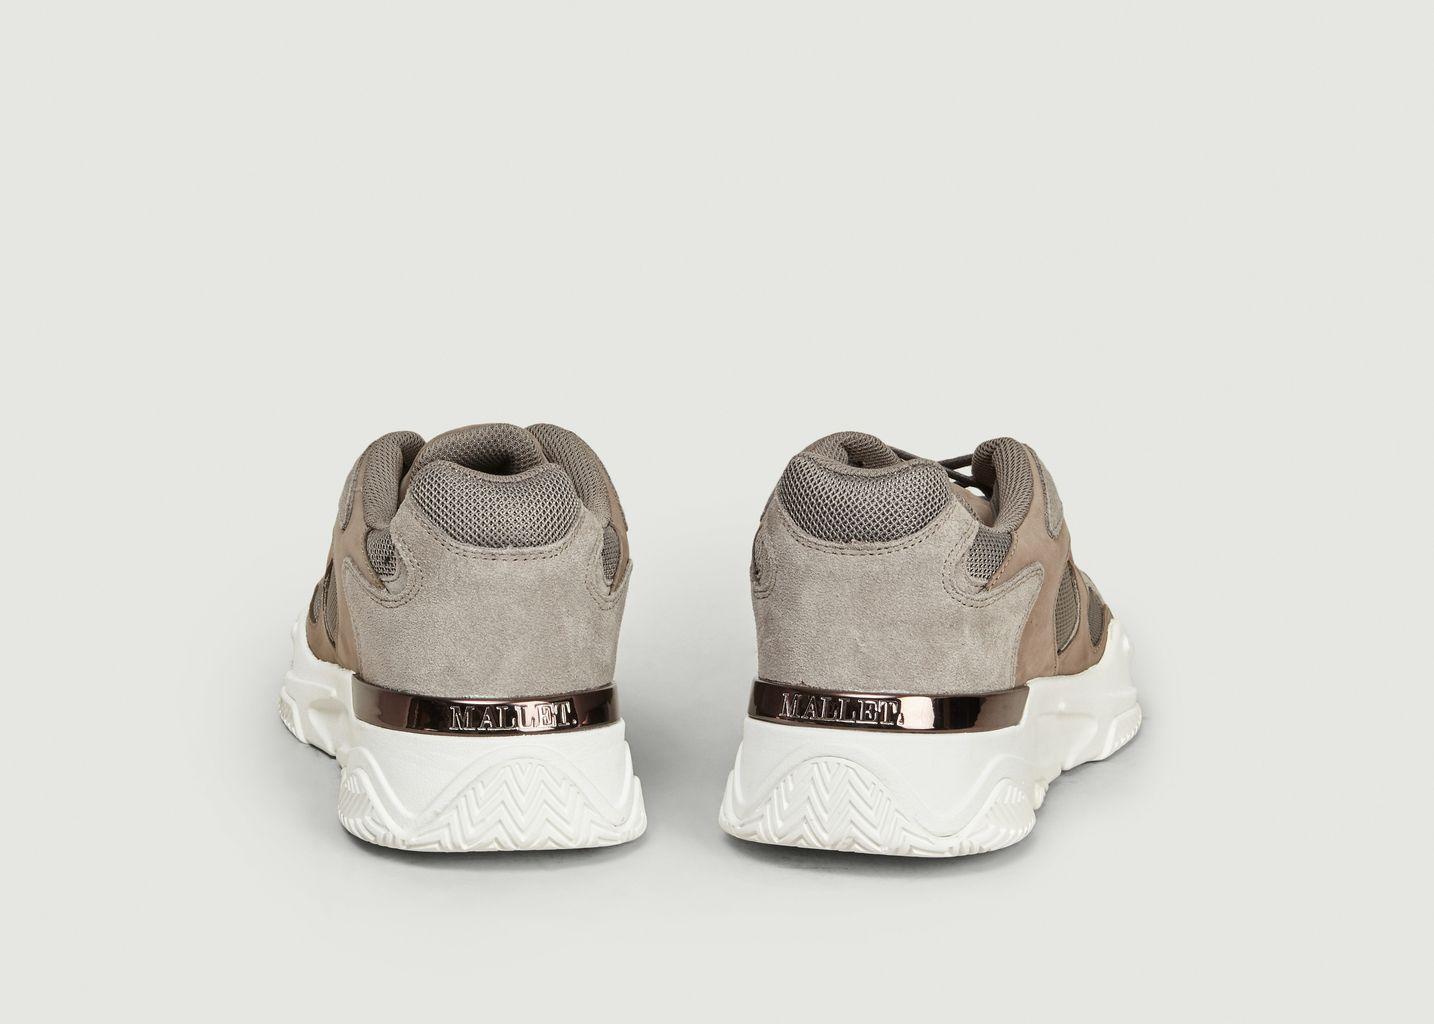 Sneakers Lurus Suède Nubuck Stone White - Mallet Footwear